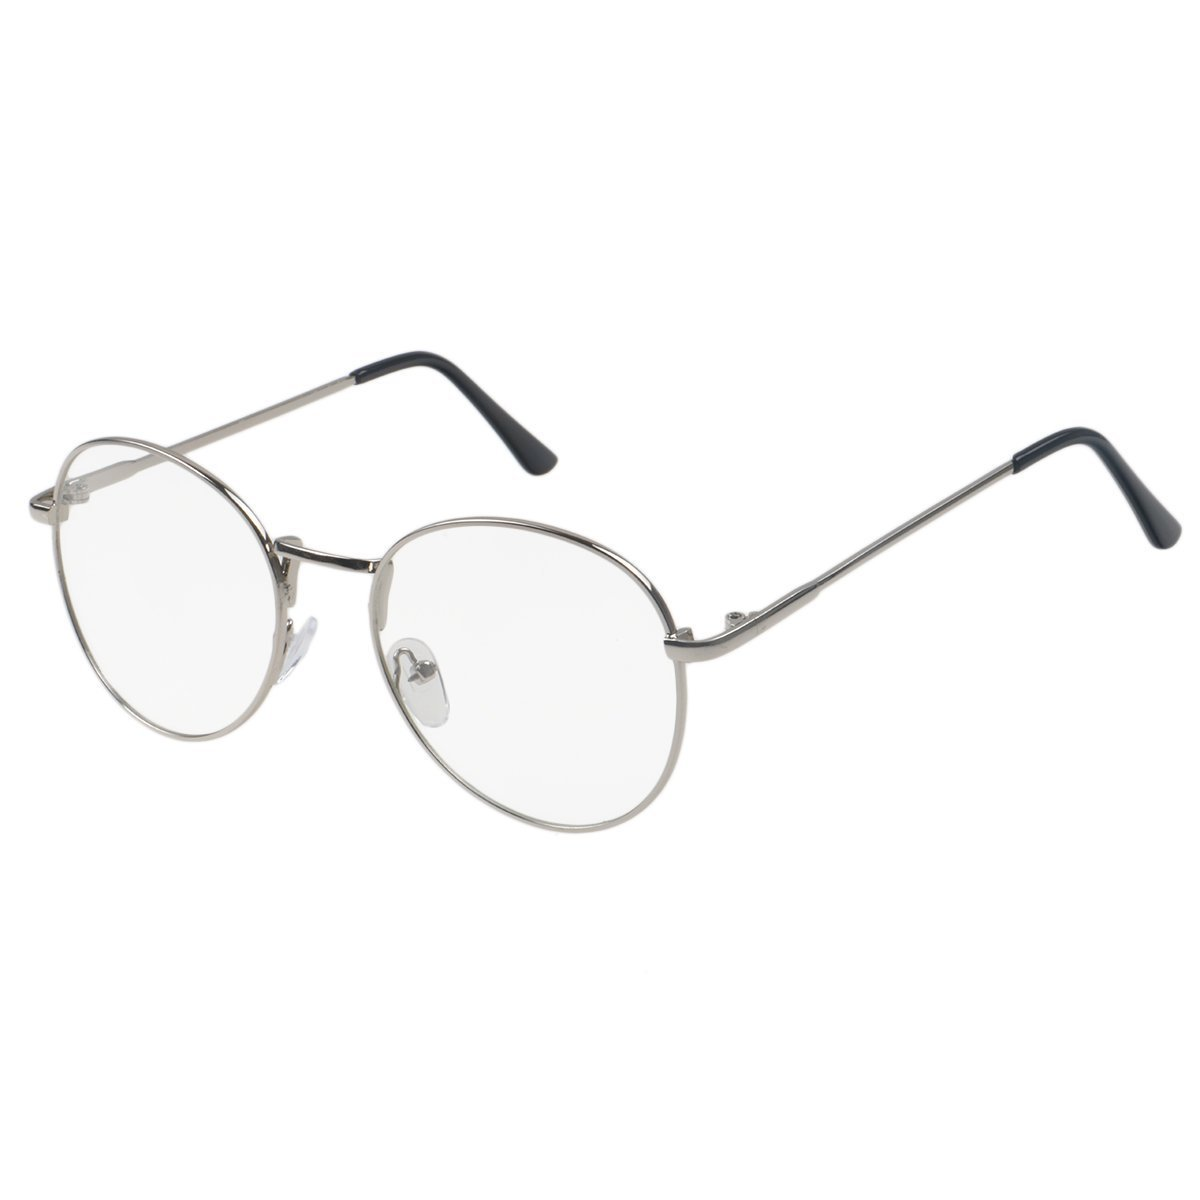 443086ce166 Simvey Retro Round Oversized Prescription Metal Eyeglasses Frame Clear Lens  Glasses product image